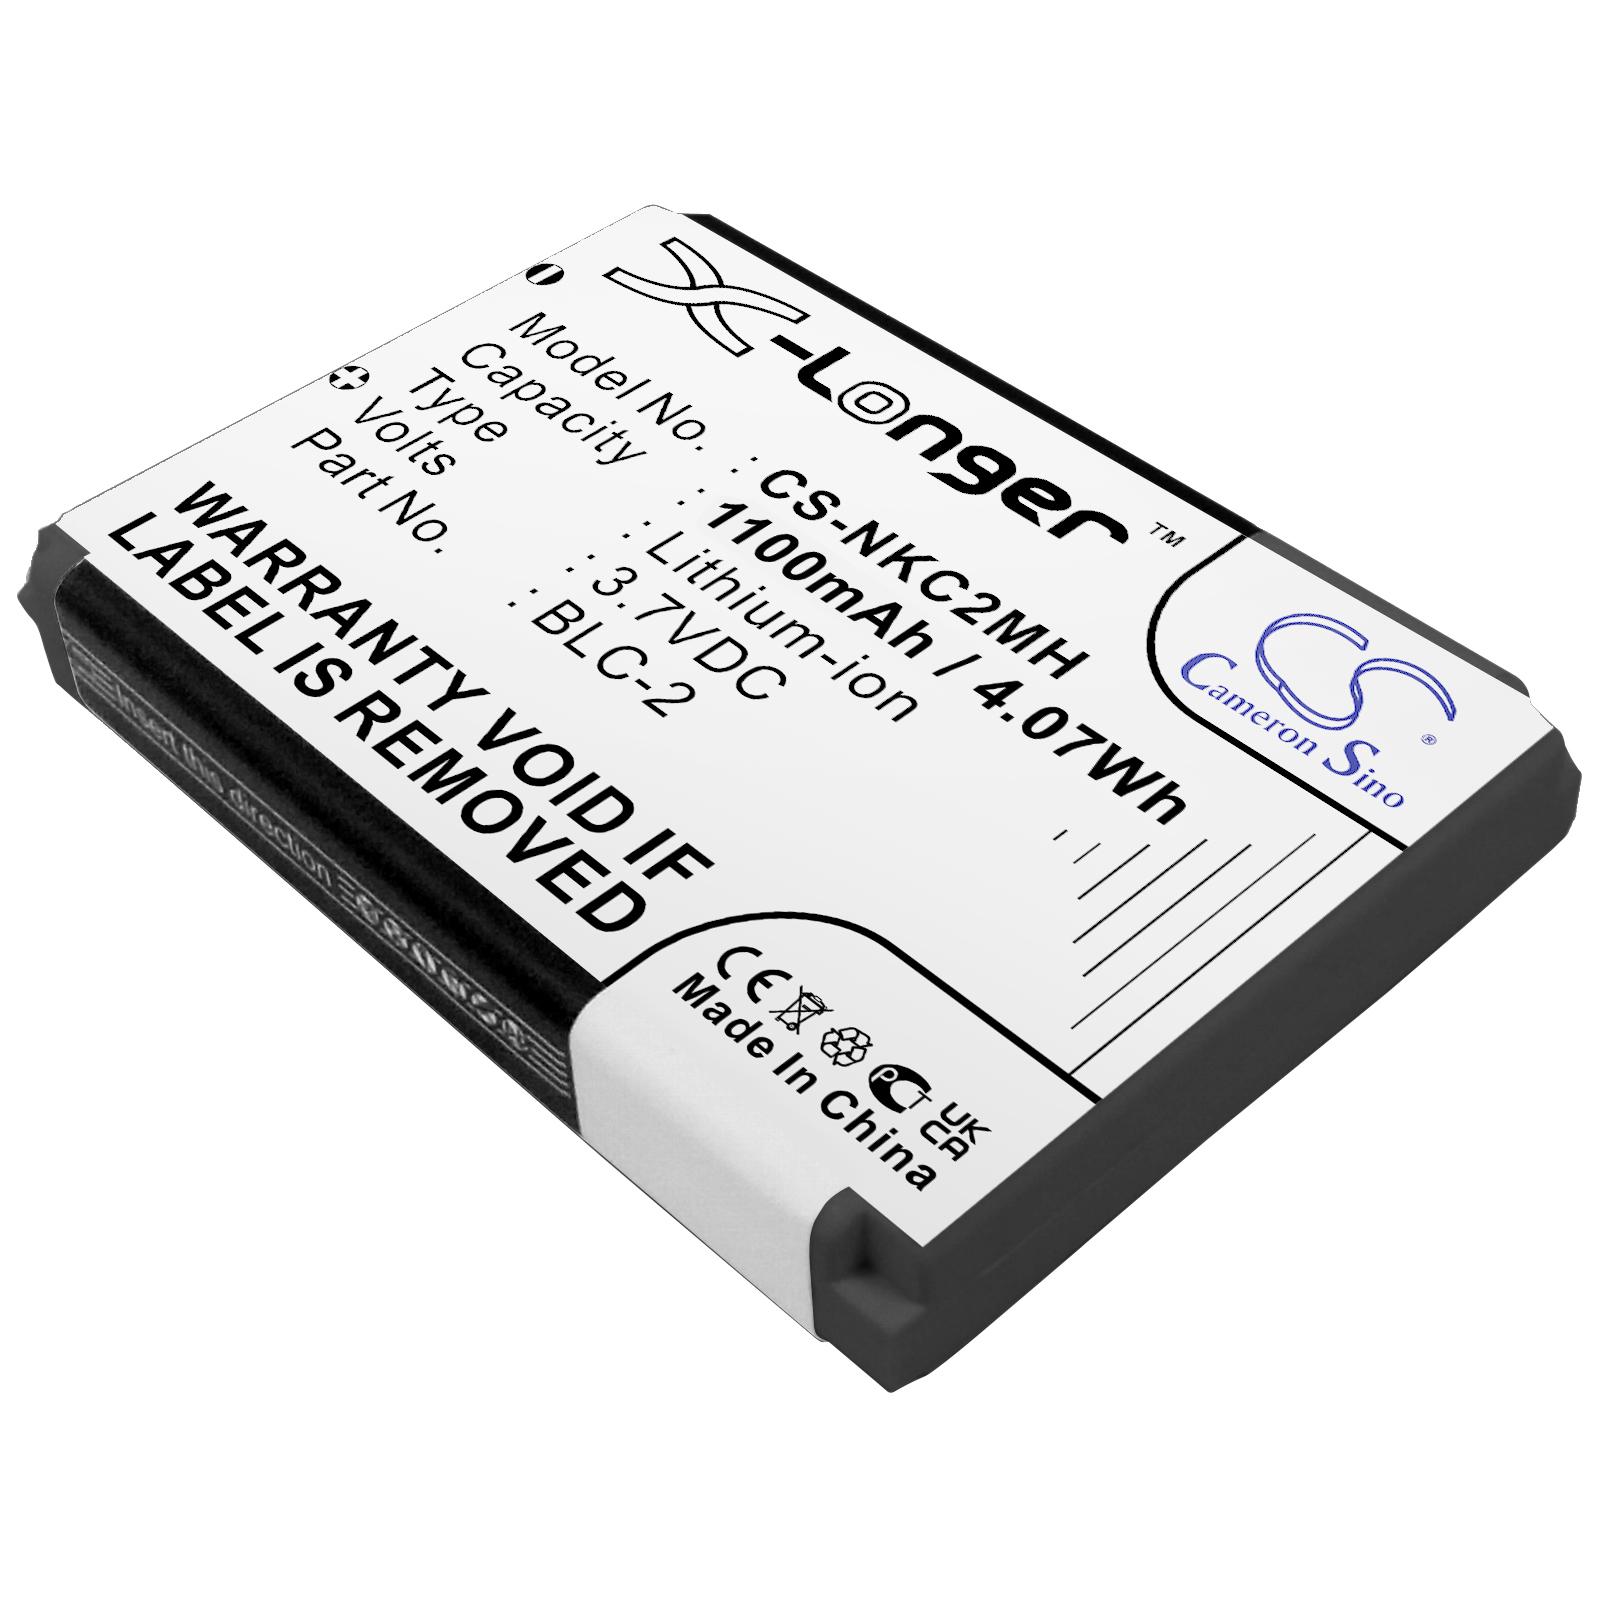 Cameron Sino baterie do mobilů pro NOKIA 3510i 3.7V Li-ion 1350mAh bílá - neoriginální